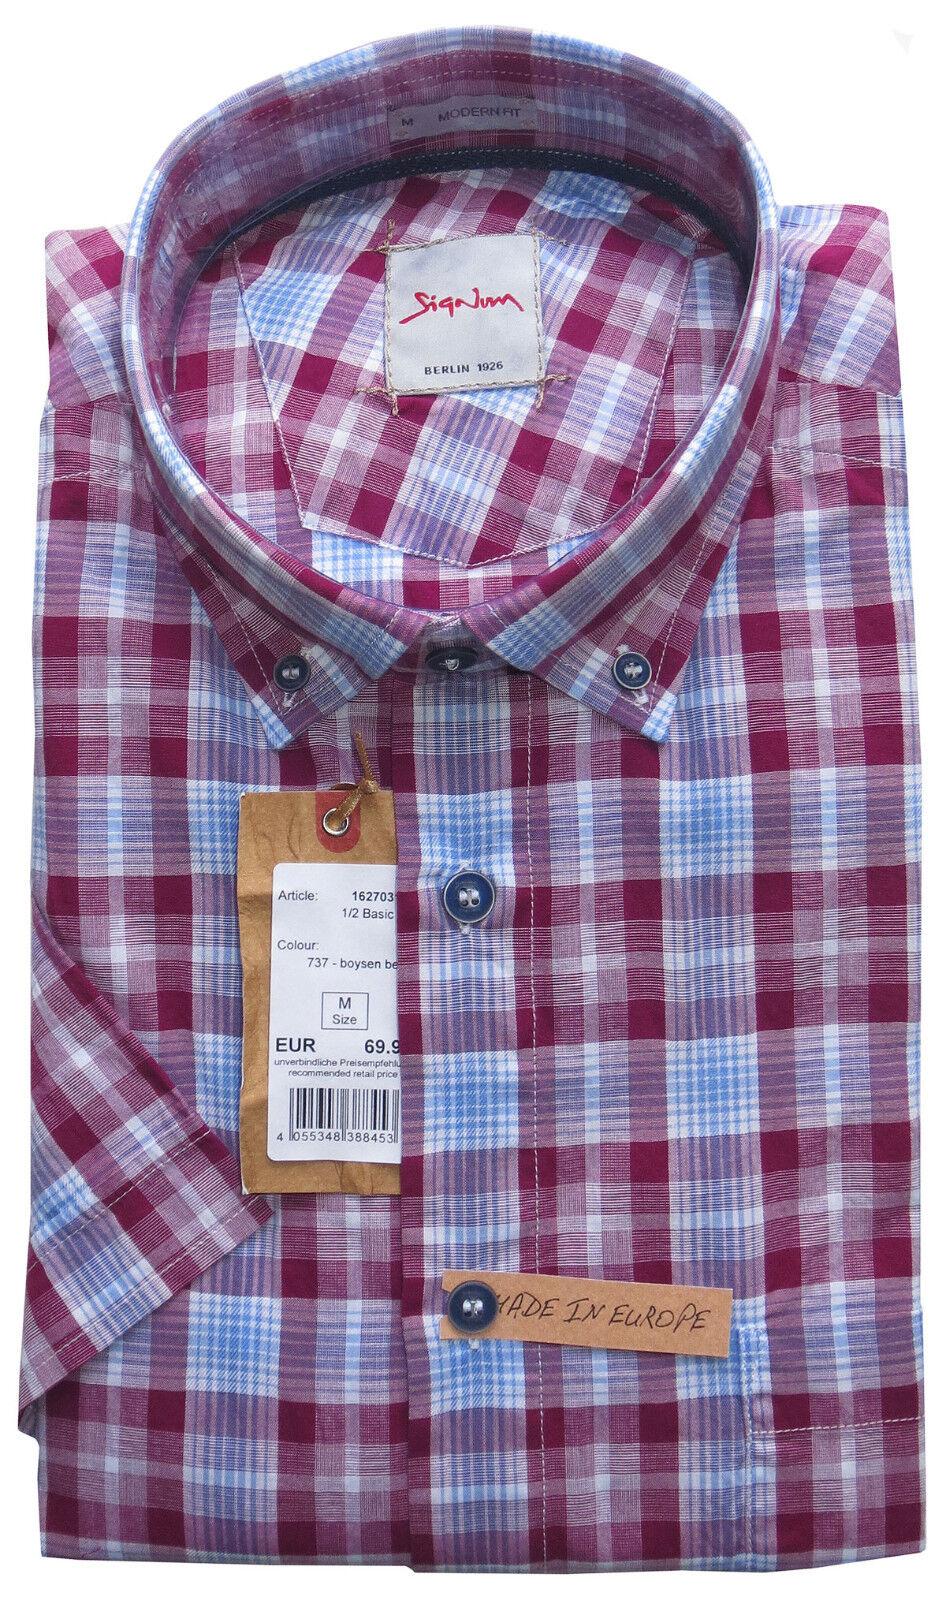 SIGNUM Camicia a maniche corte Modern Fit Nuovo Taglia M OFFERTA SPECIALE A QUADRI   s3.0250